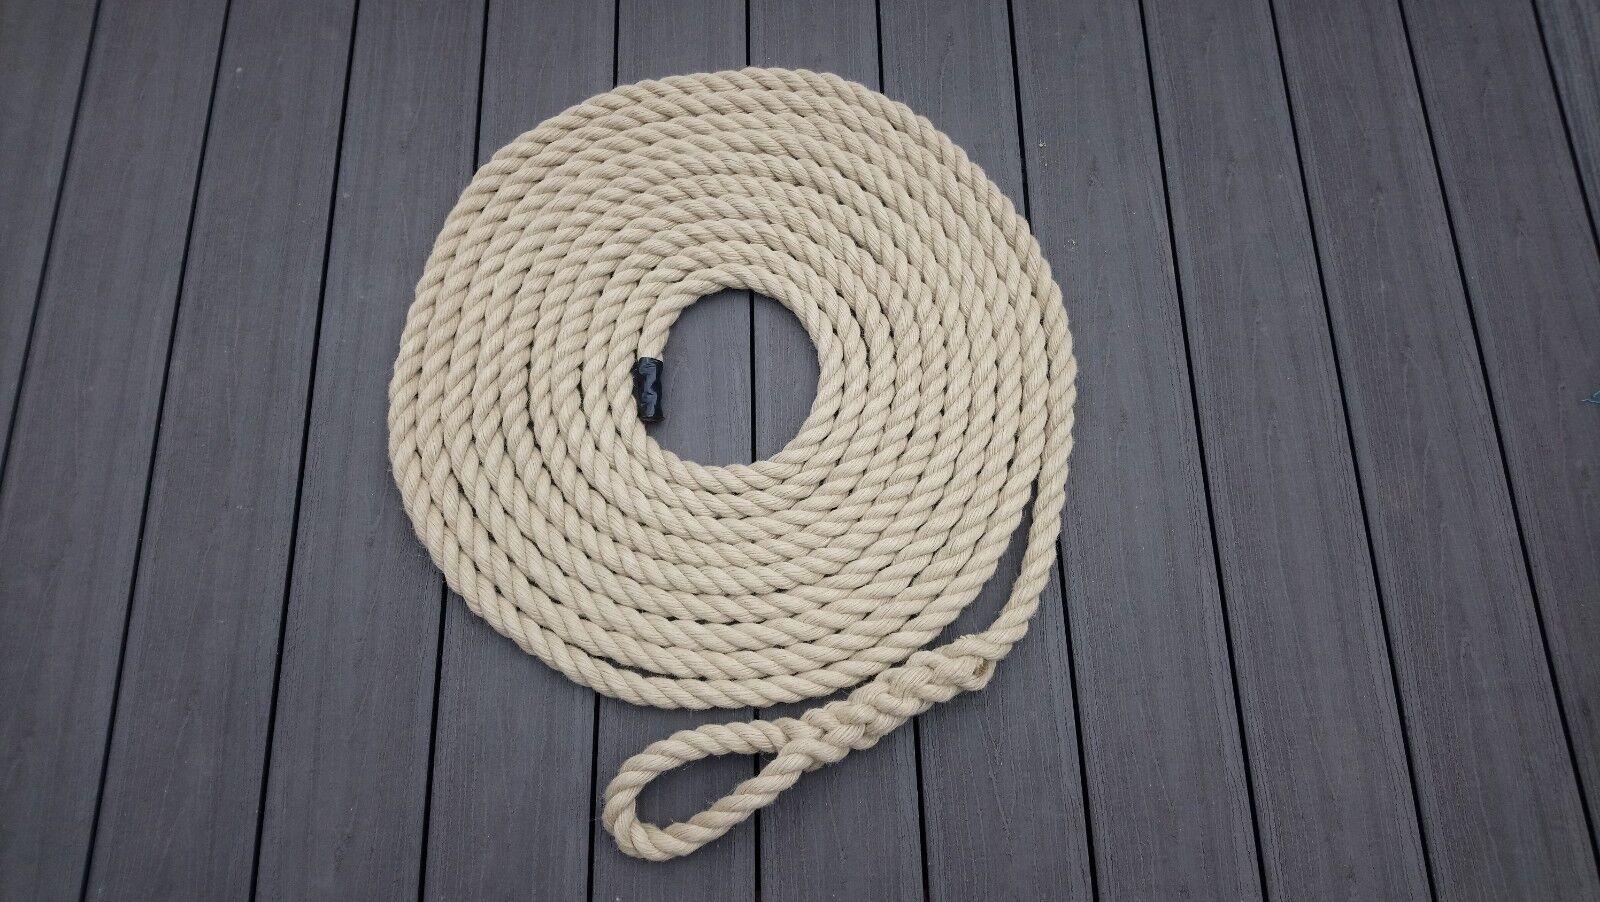 28mm Synthetic Hemp Gym Climbing Rope - Fitness - Training - Choose Length